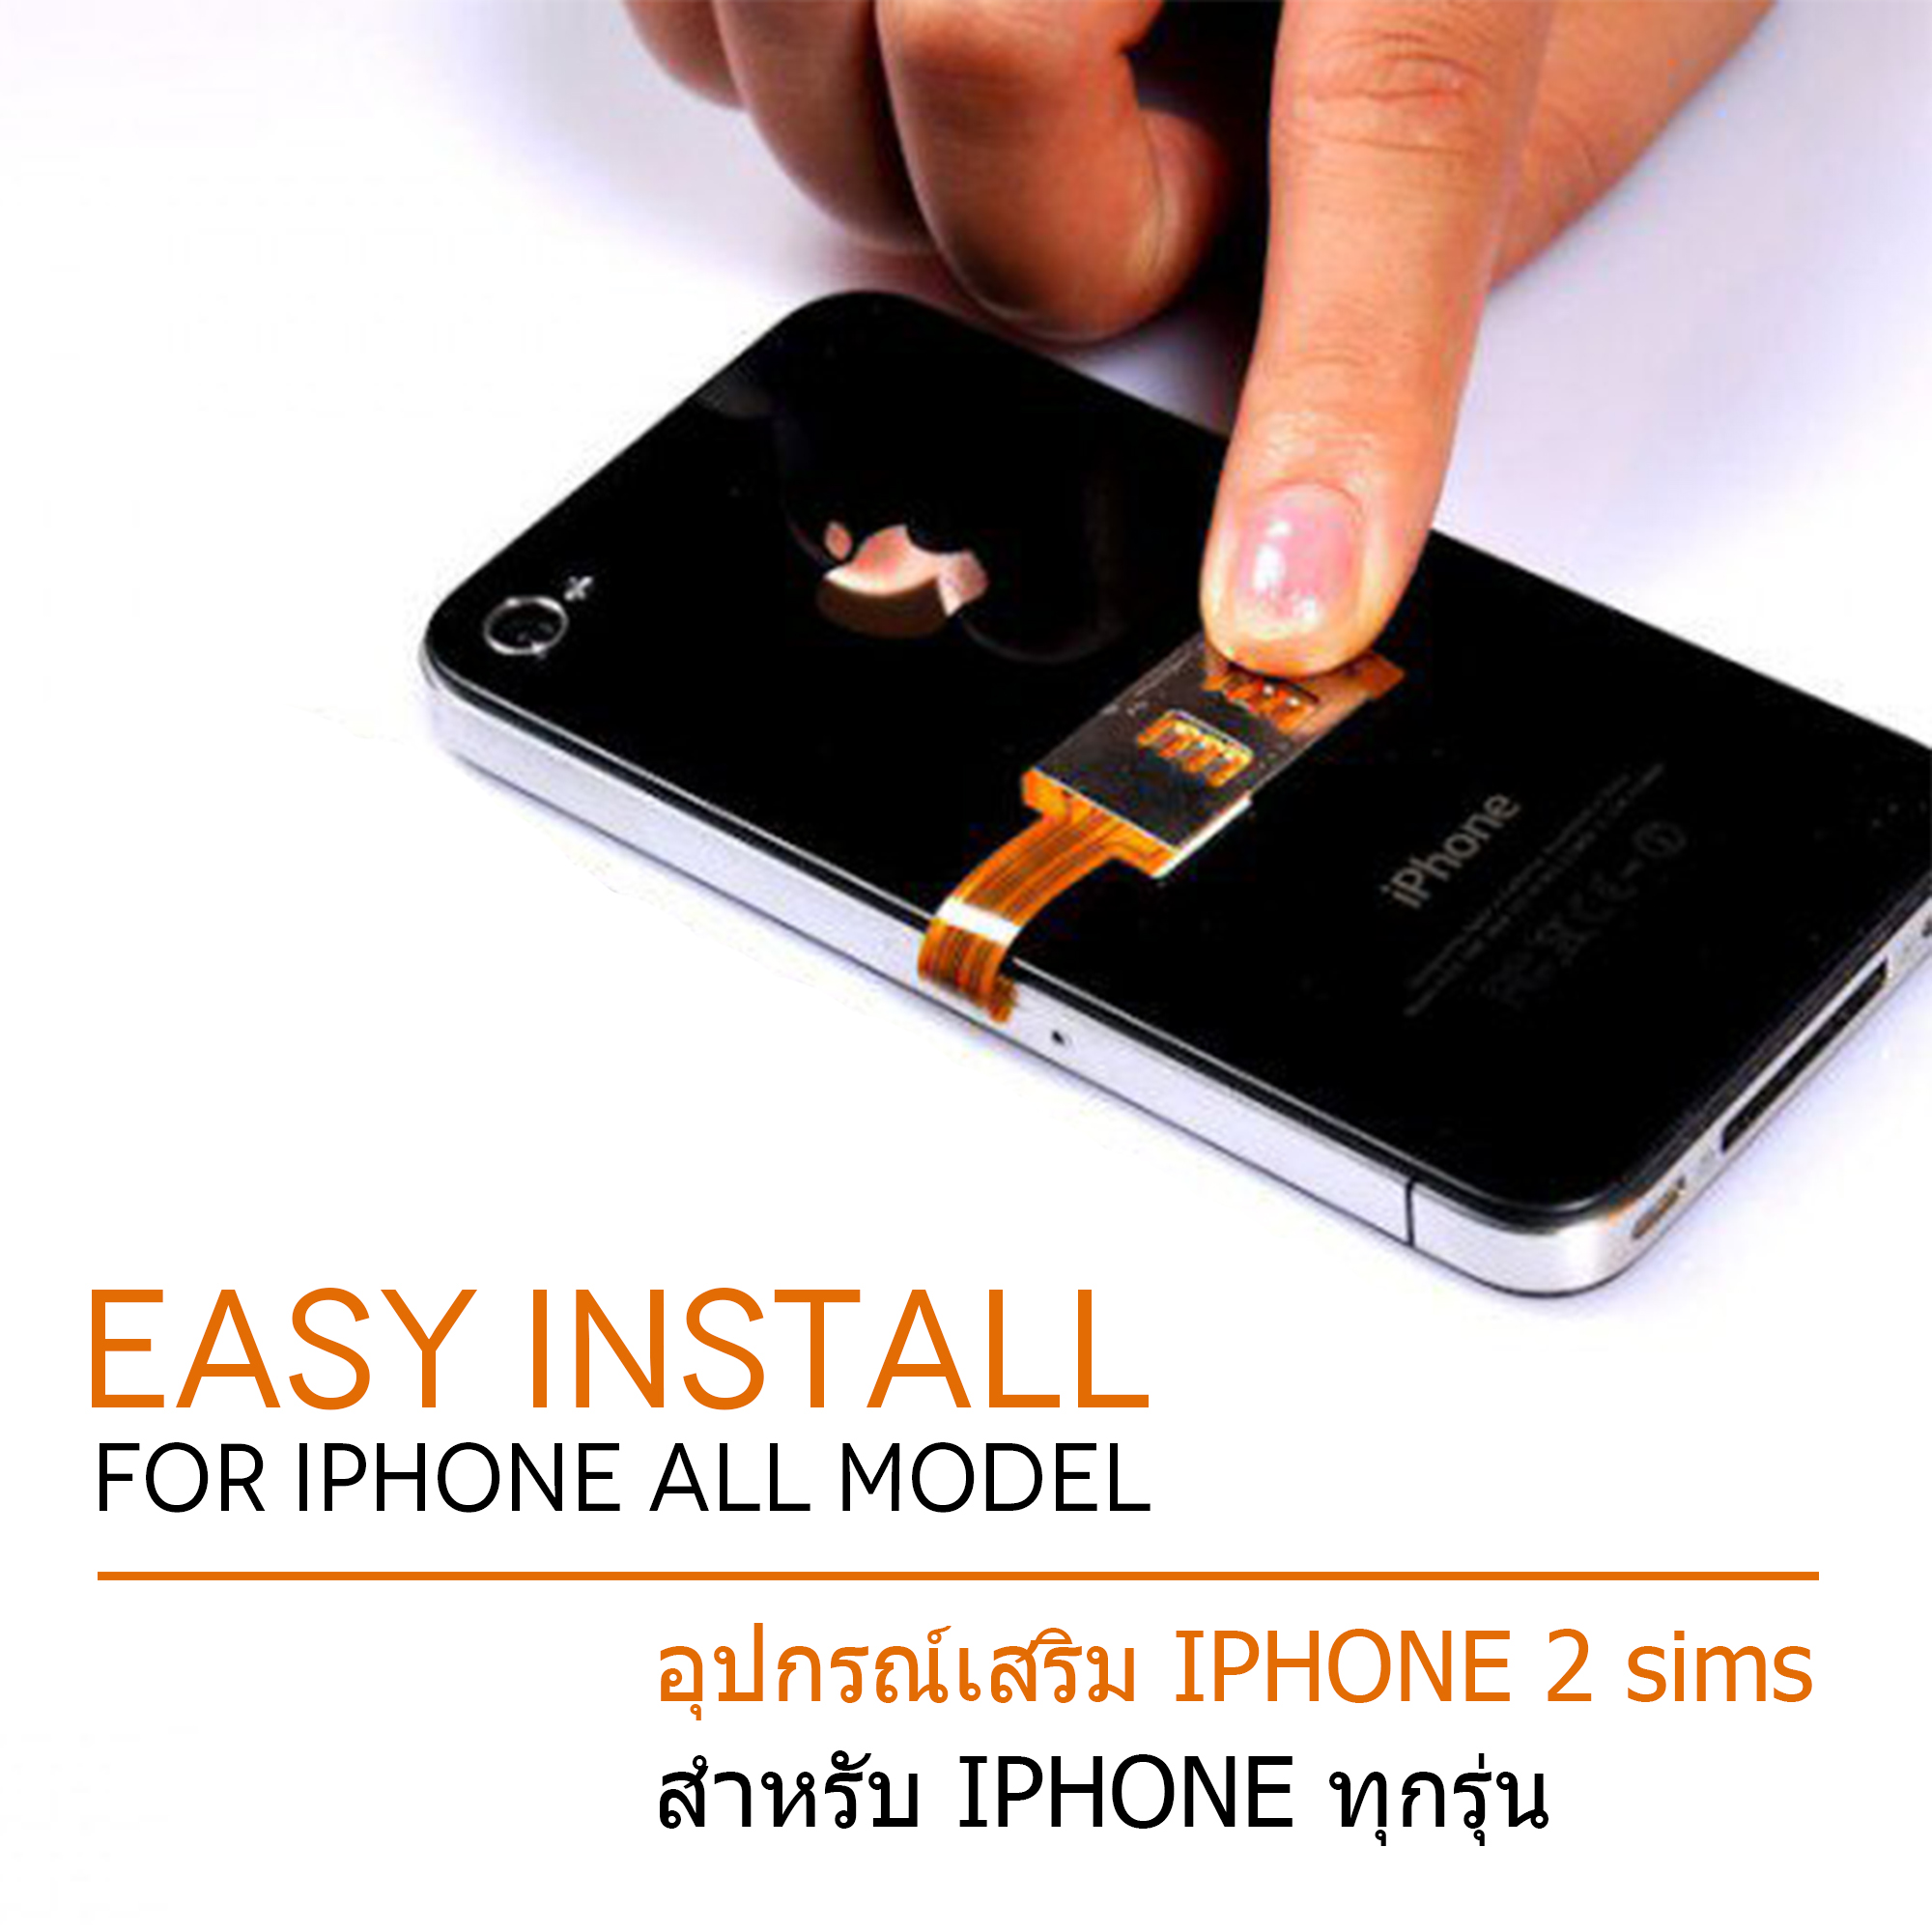 Adapter Iphone 2 ซิม Dual Sim Iphone